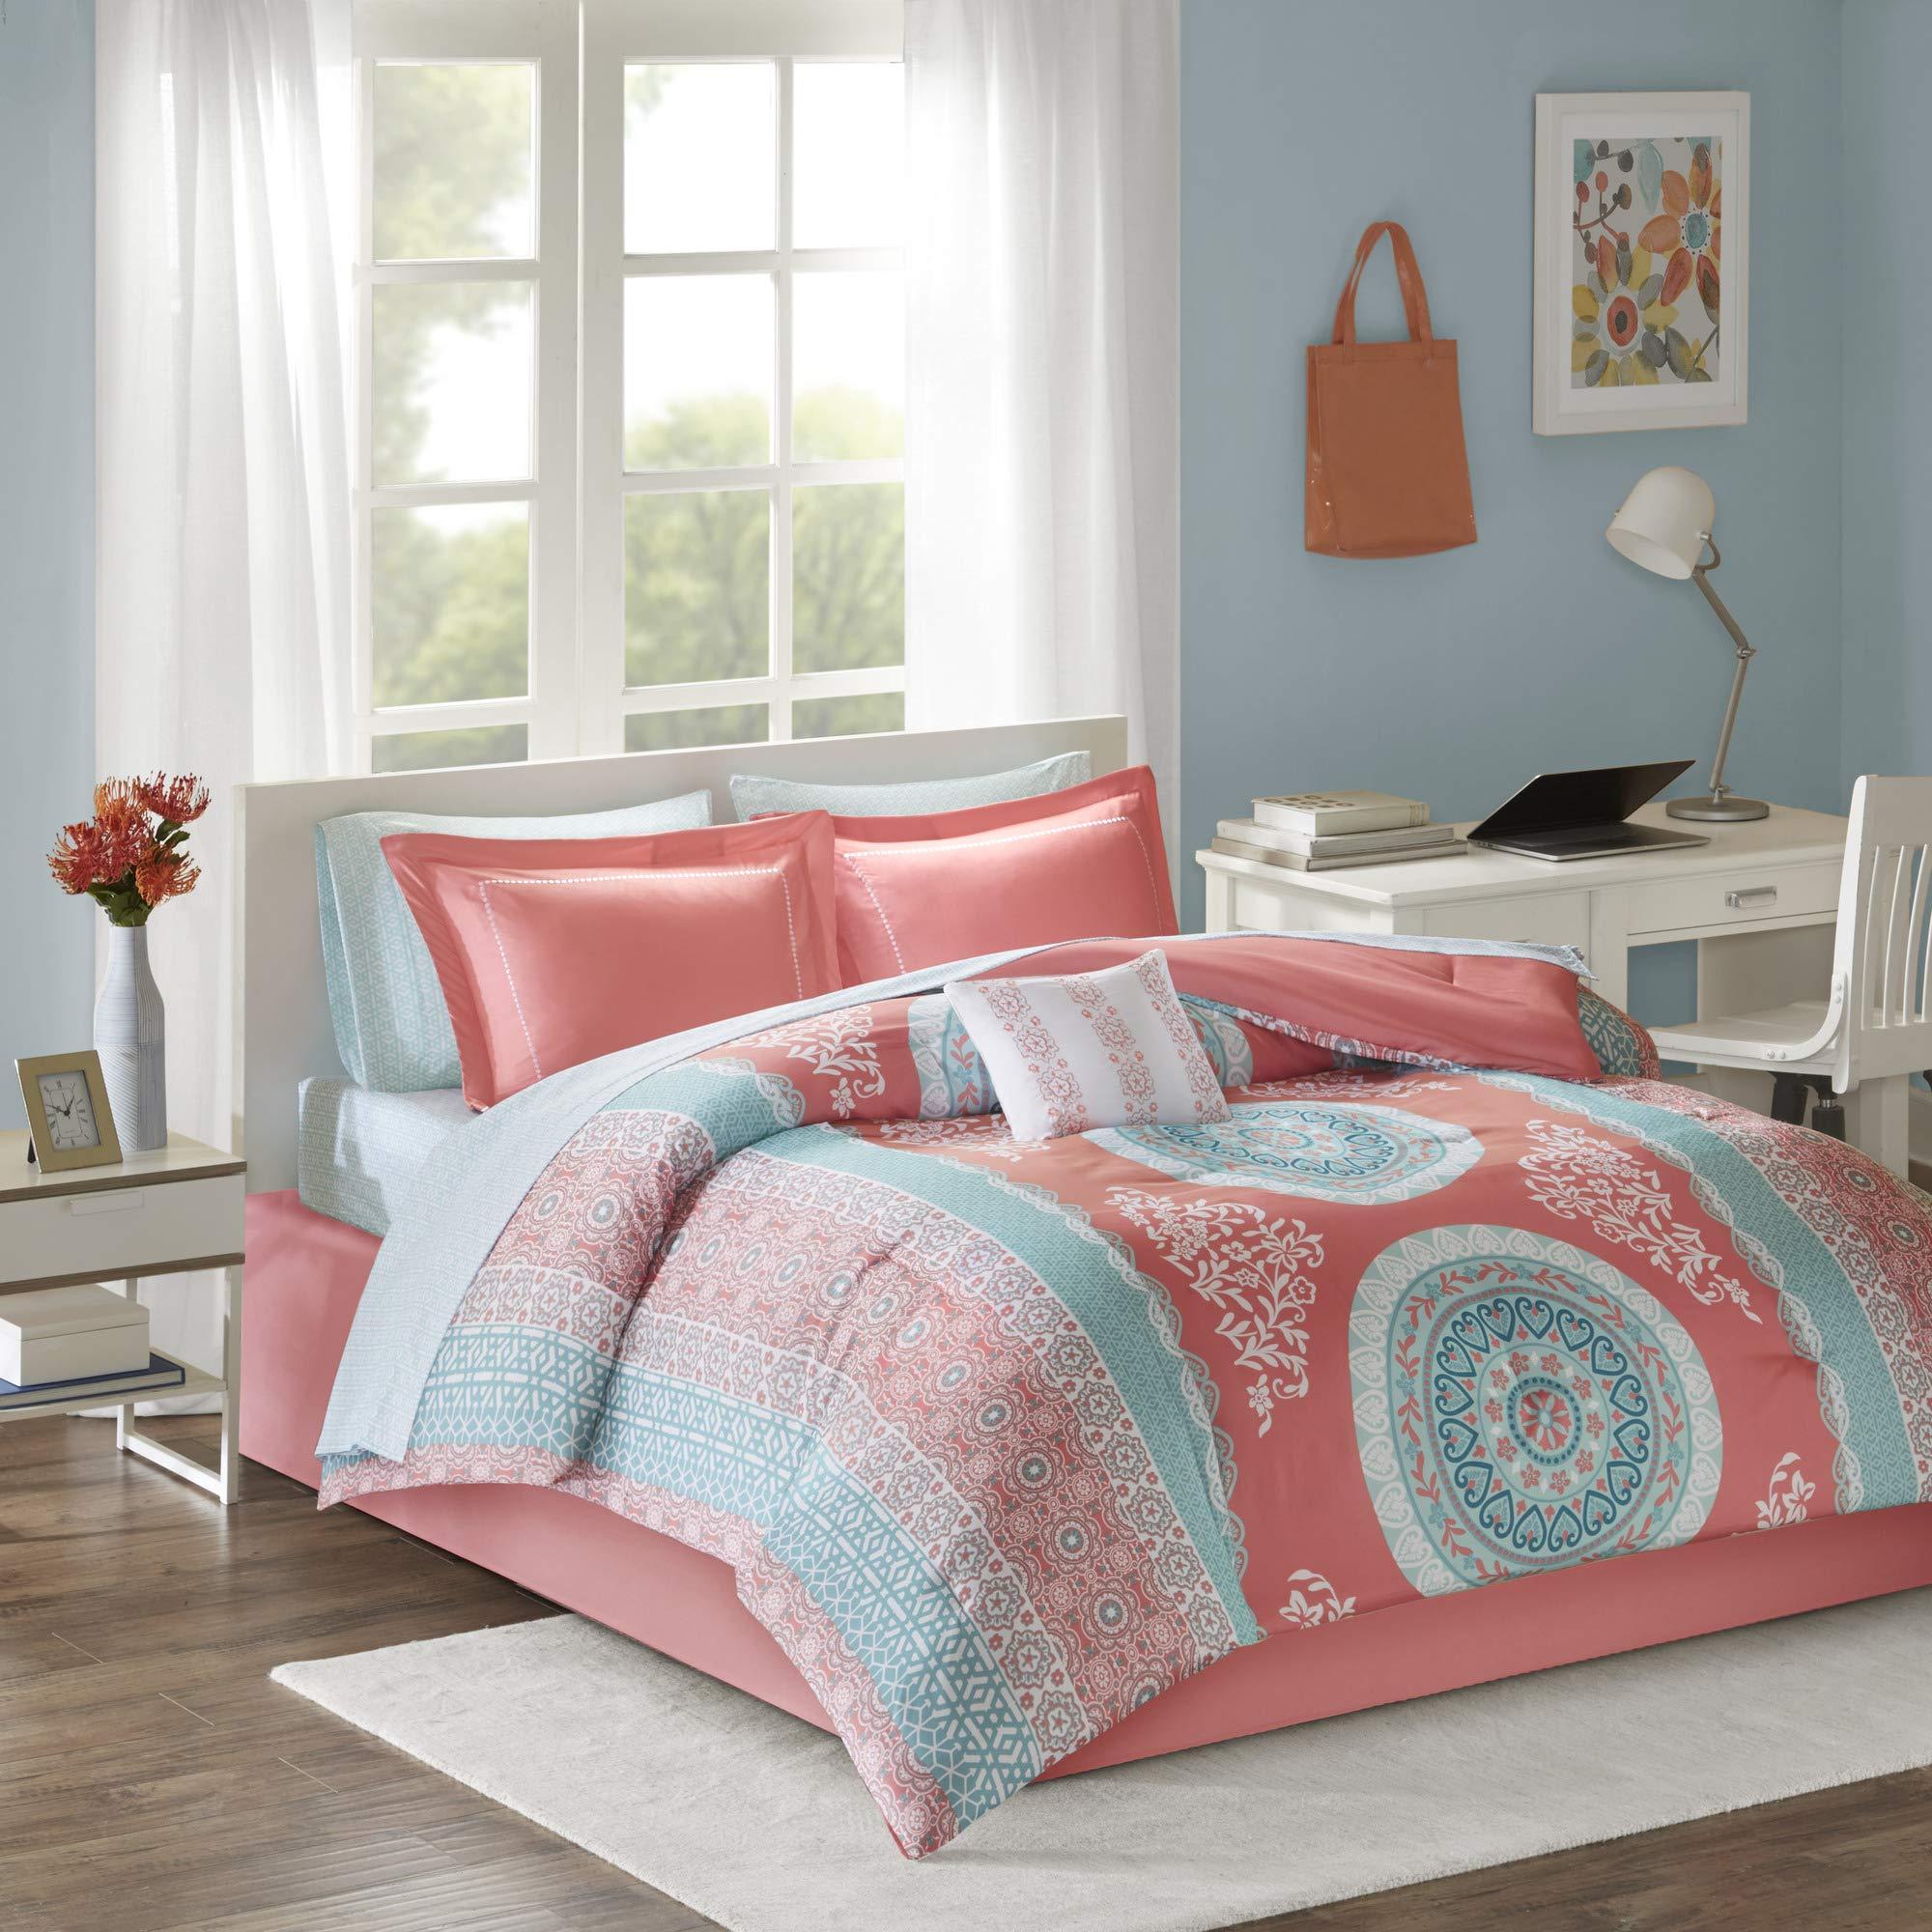 Intelligent Design Loretta Comforter Set Queen Size Bed in A Bag - Coral, Aqua, Bohemian Chic Medallion - 9 Piece Bed Sets - Ultra Soft Microfiber Teen Bedding for Girls Bedroom by Intelligent Design